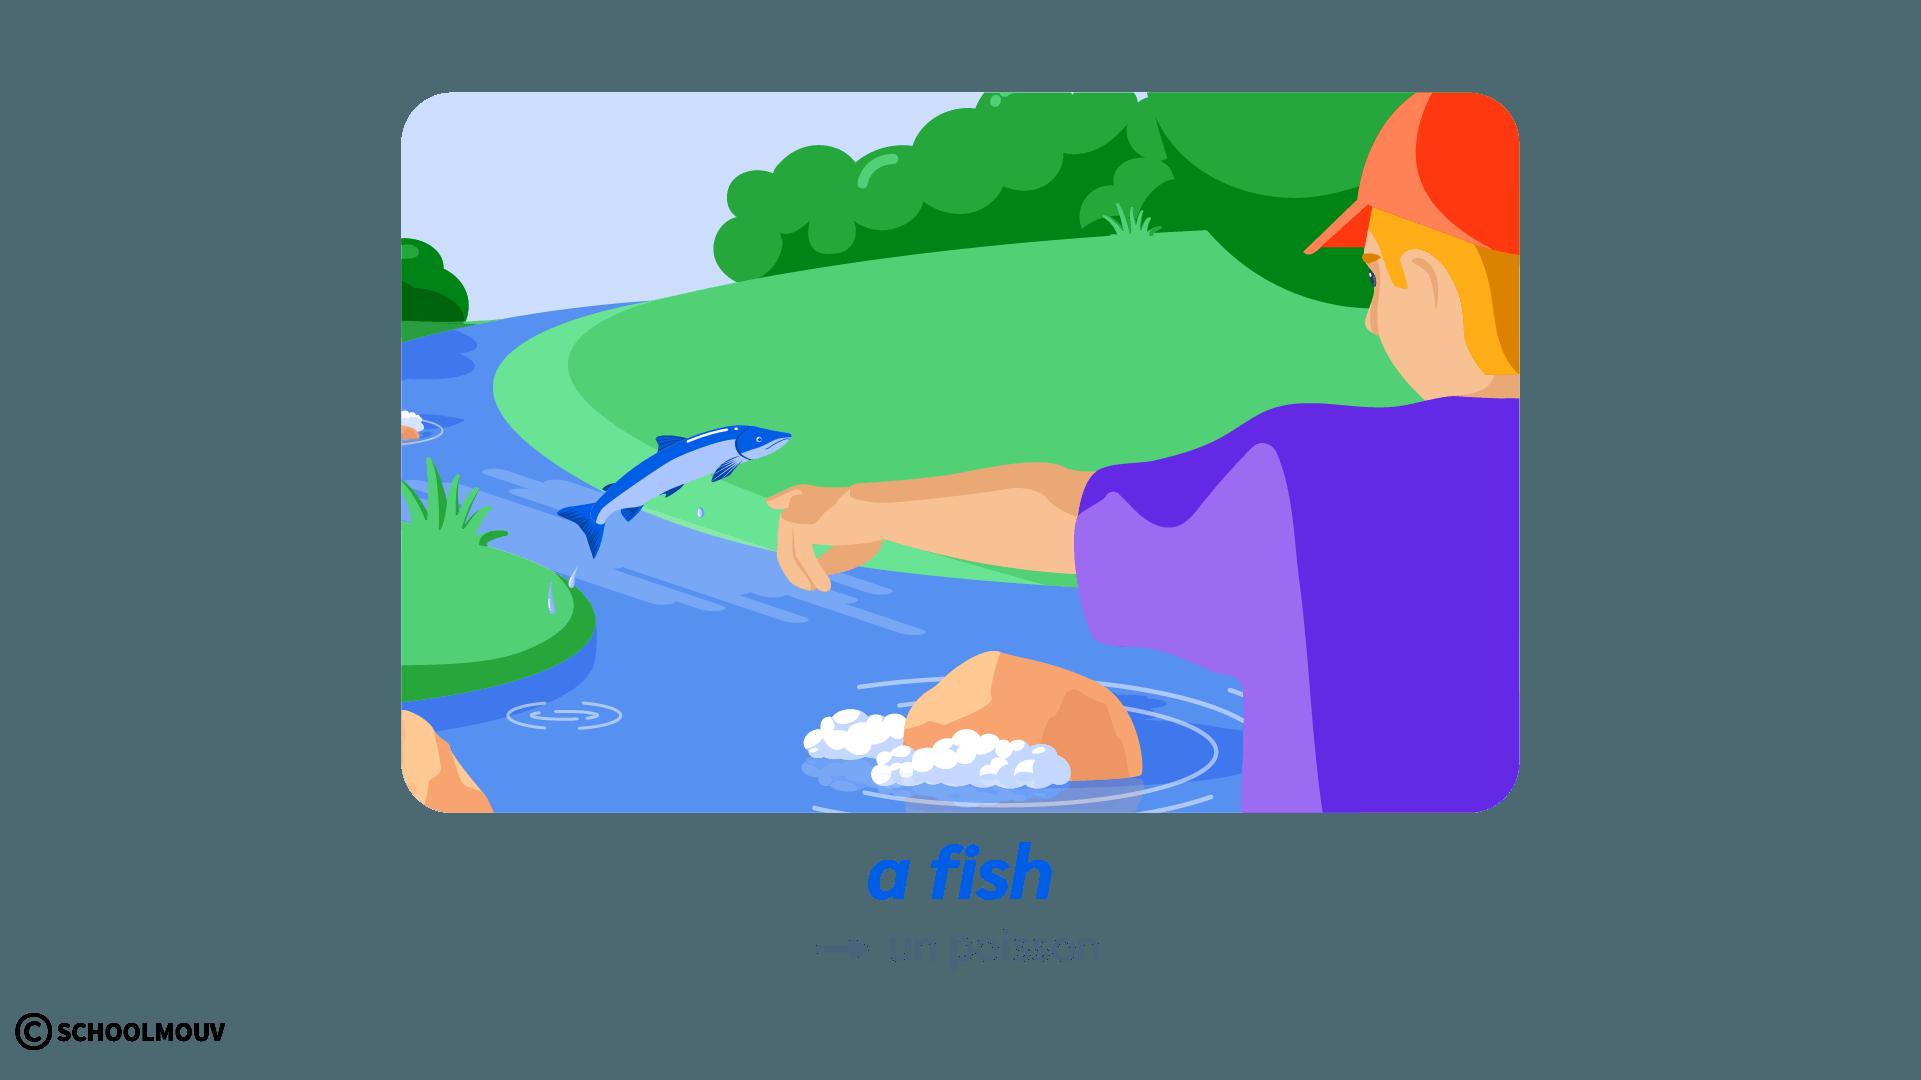 fish poisson anglais animals